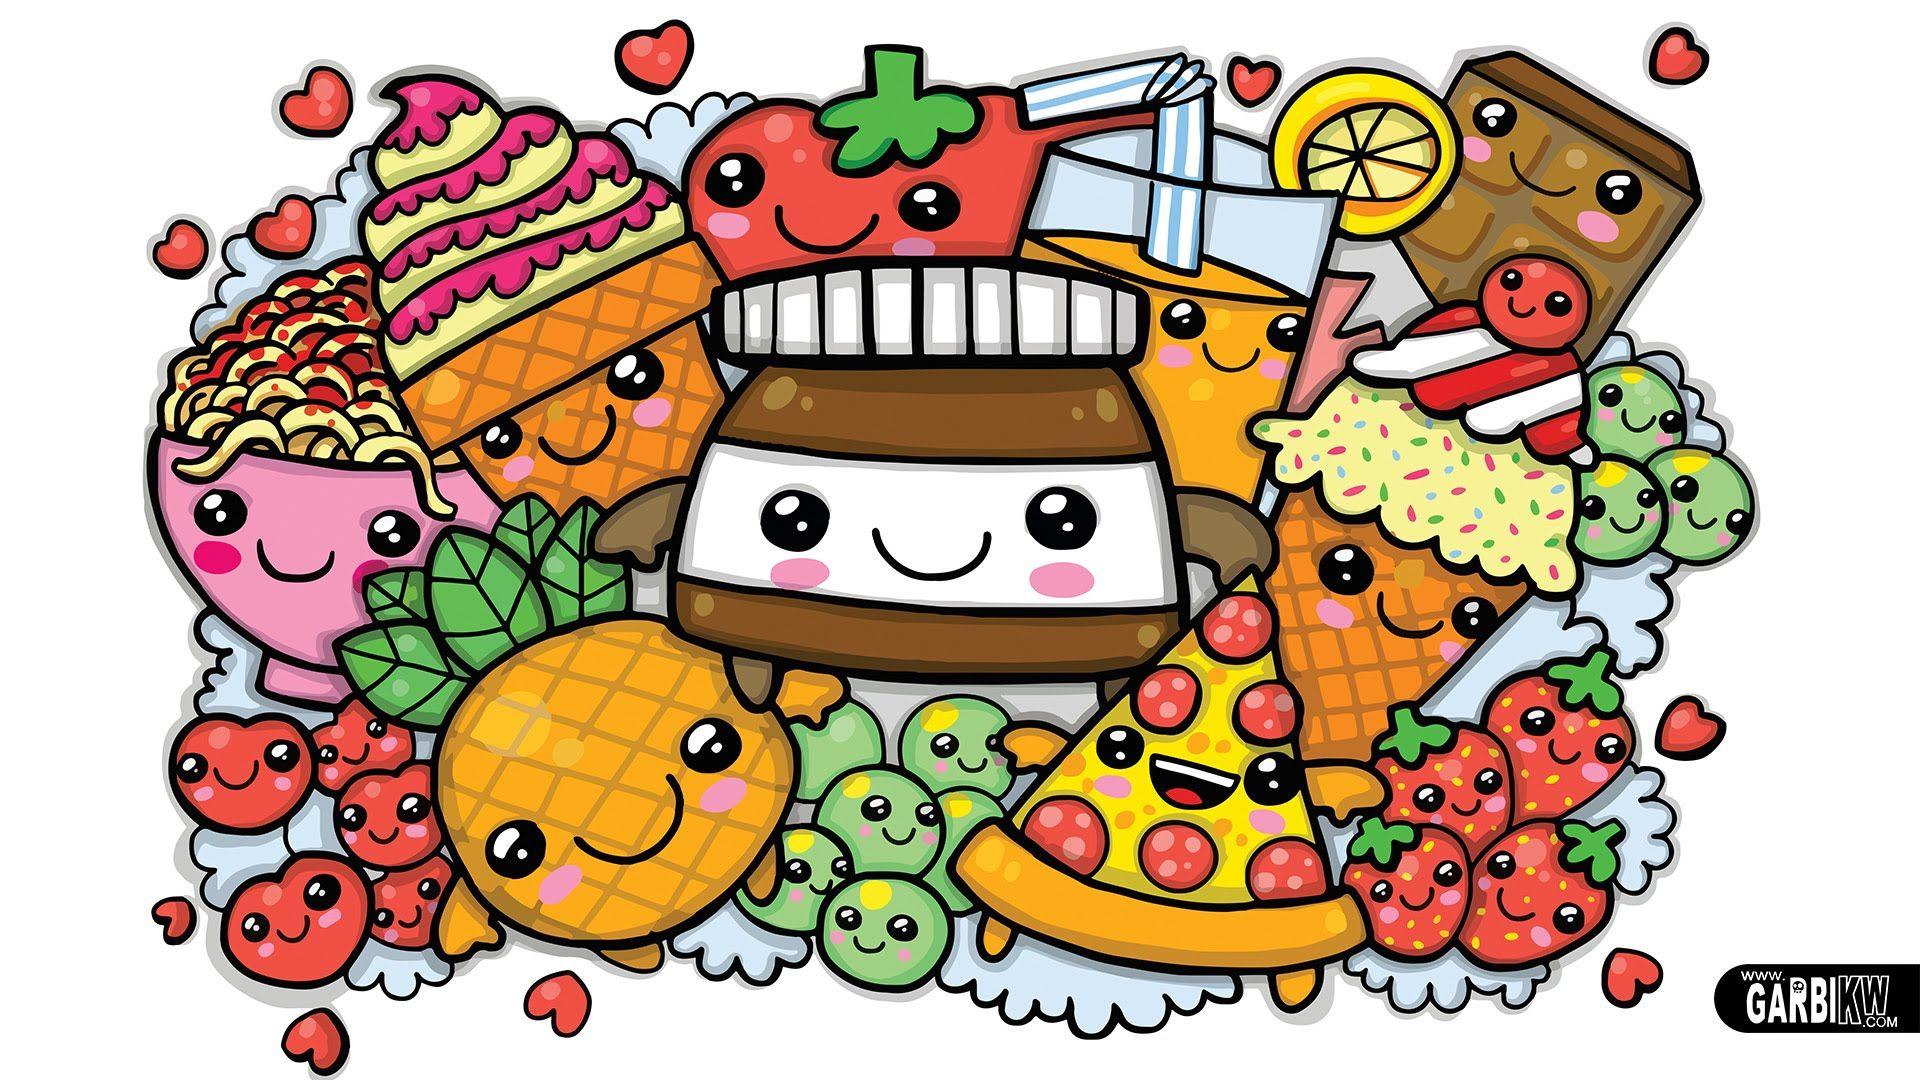 Colouring a cute Nutella and Kawaii Food cute Graffiti